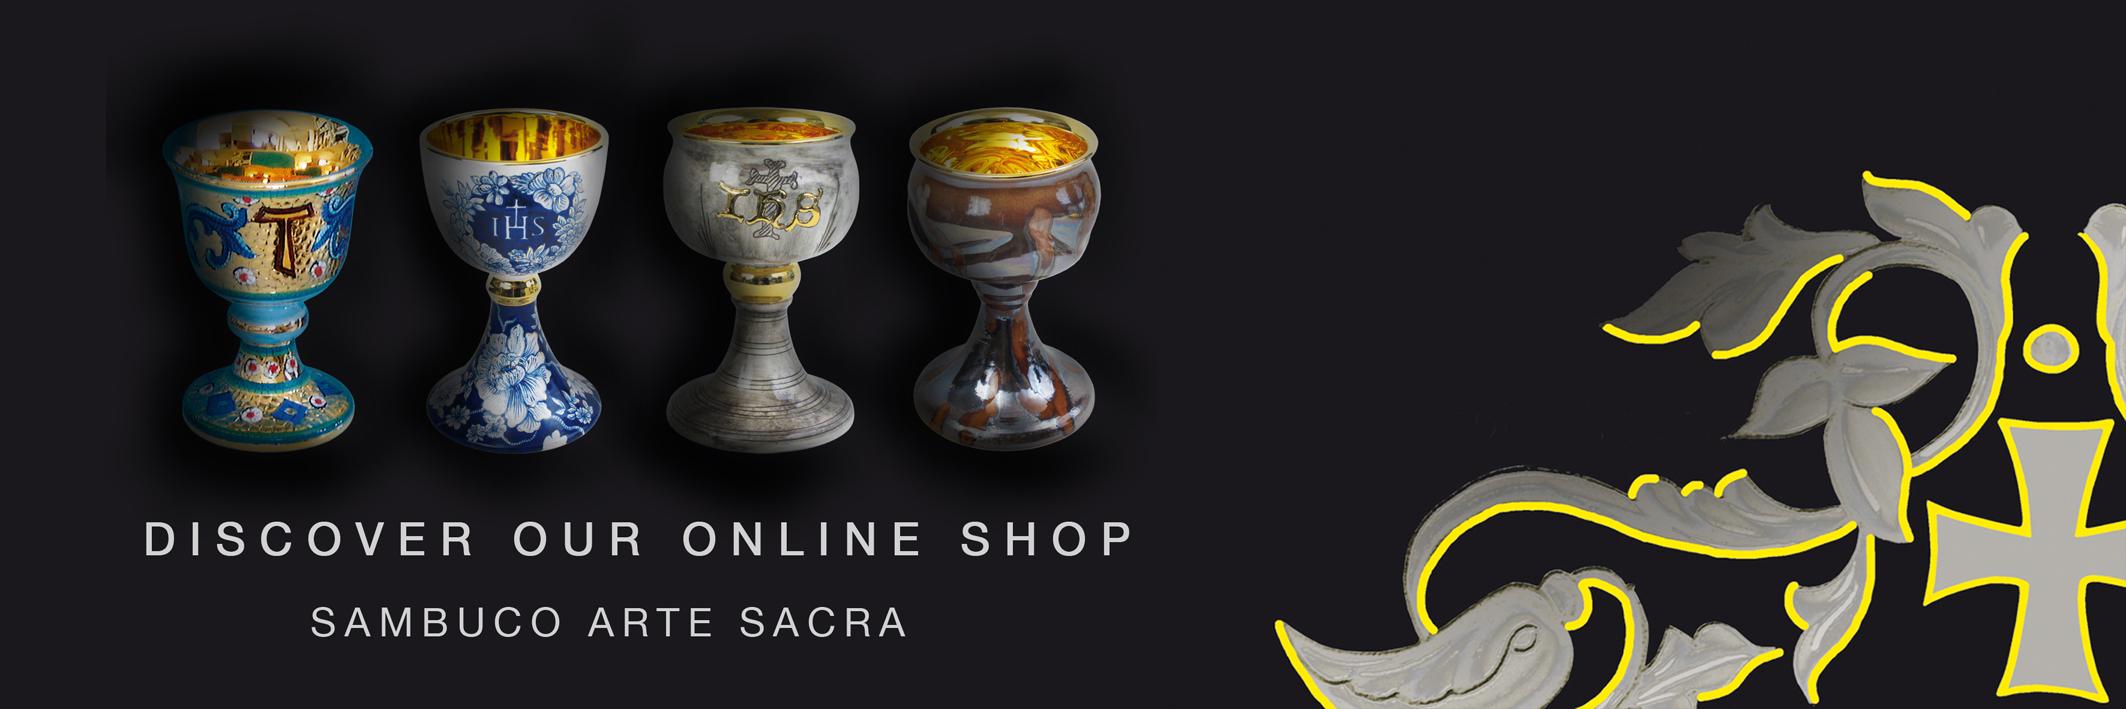 Sambuco Arte Sacra Deruta Shop online Catalog